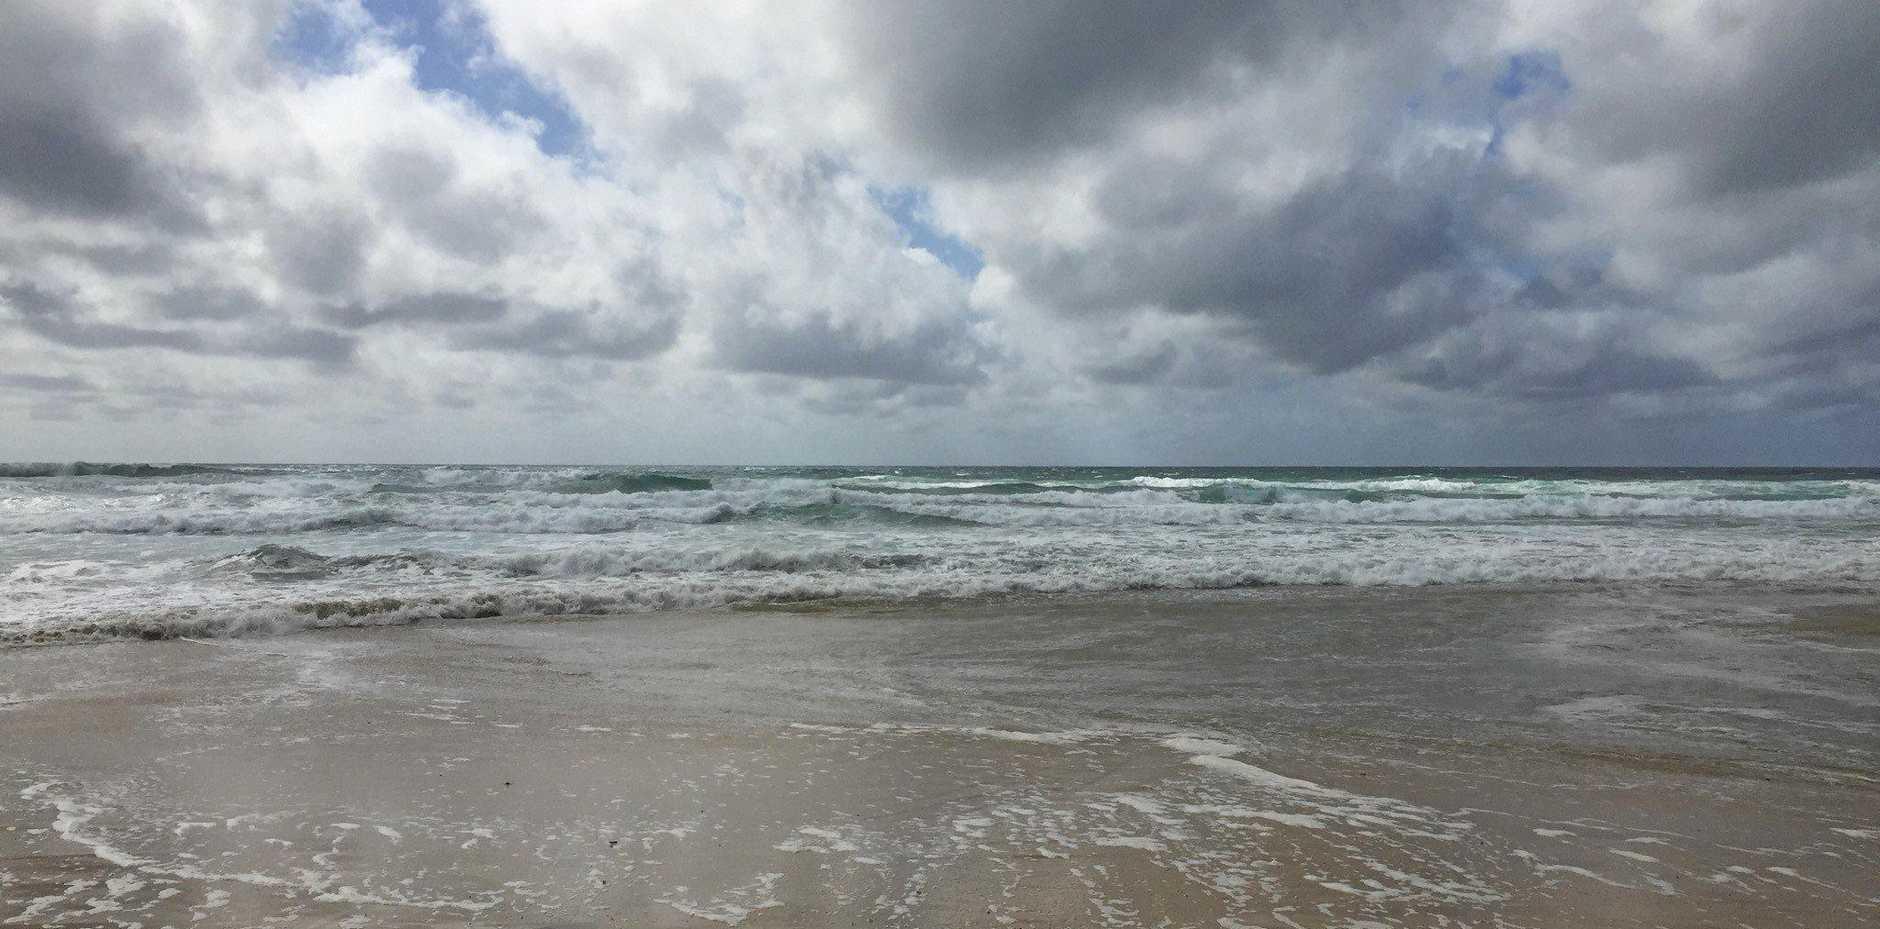 King tides at Happy Valley, Fraser Island on Thursday morning.